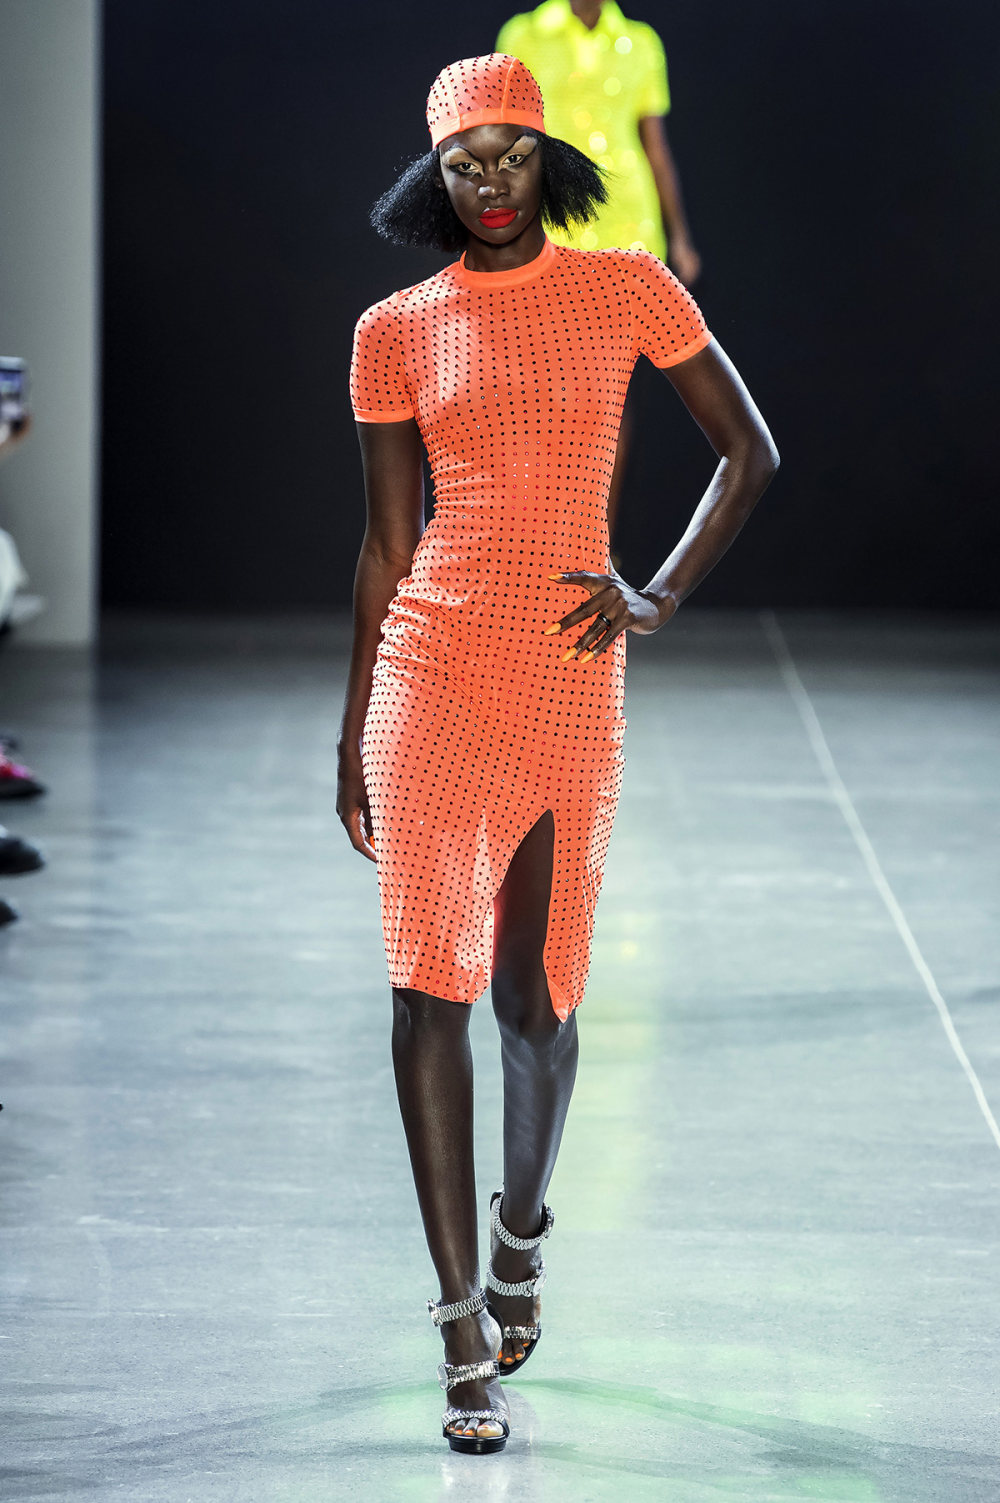 Christian Cowan时装系列虽然巨大的薄纱层状服装并没有那么特别-11.jpg